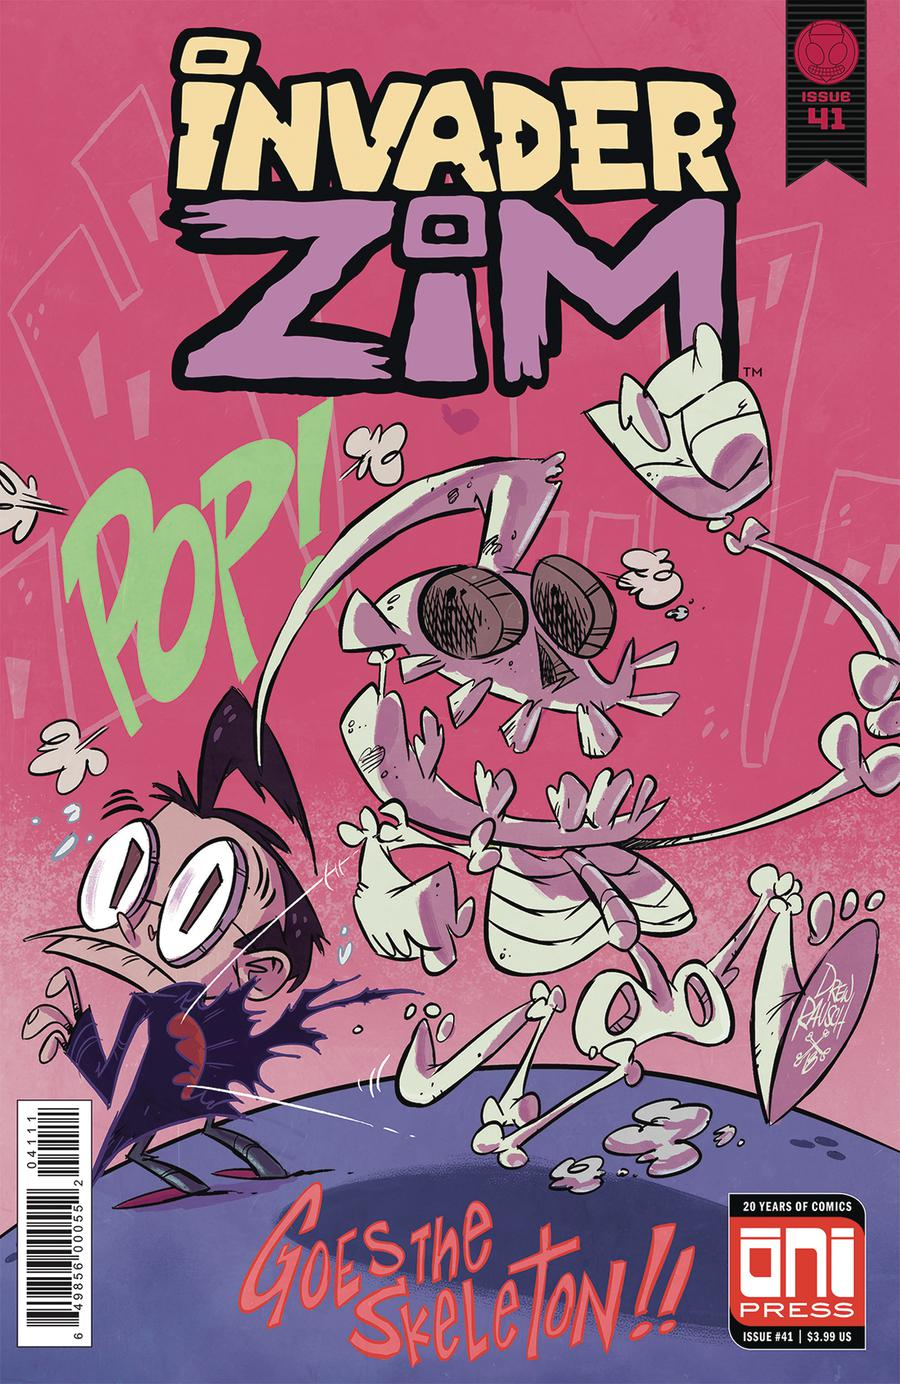 Invader Zim #41 Cover A Regular Warren Wucinich Cover